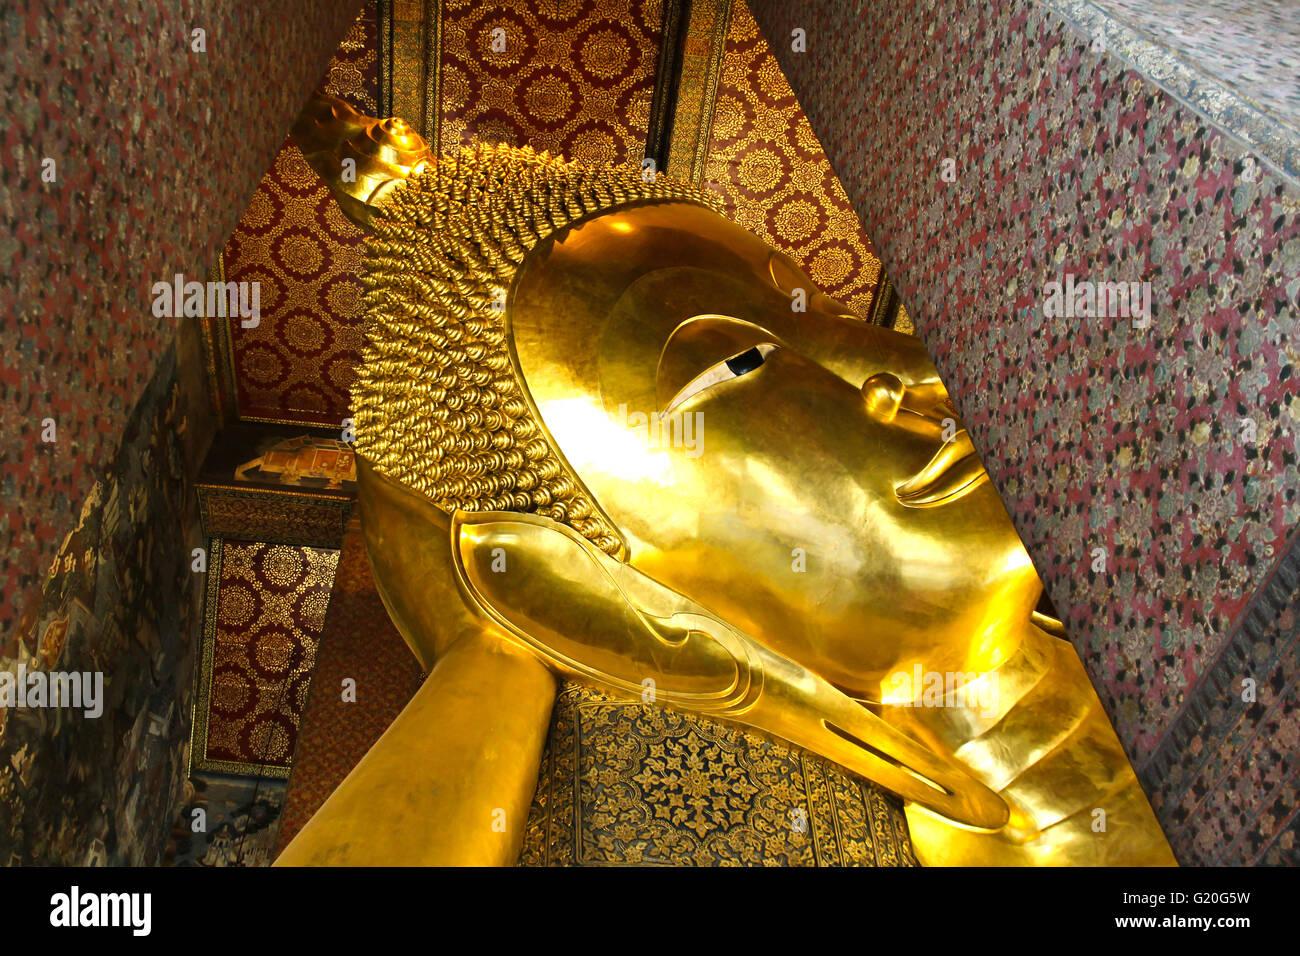 Reclining Buddha gold statue ,Wat Pho, Bangkok, Thailand. - Stock Image